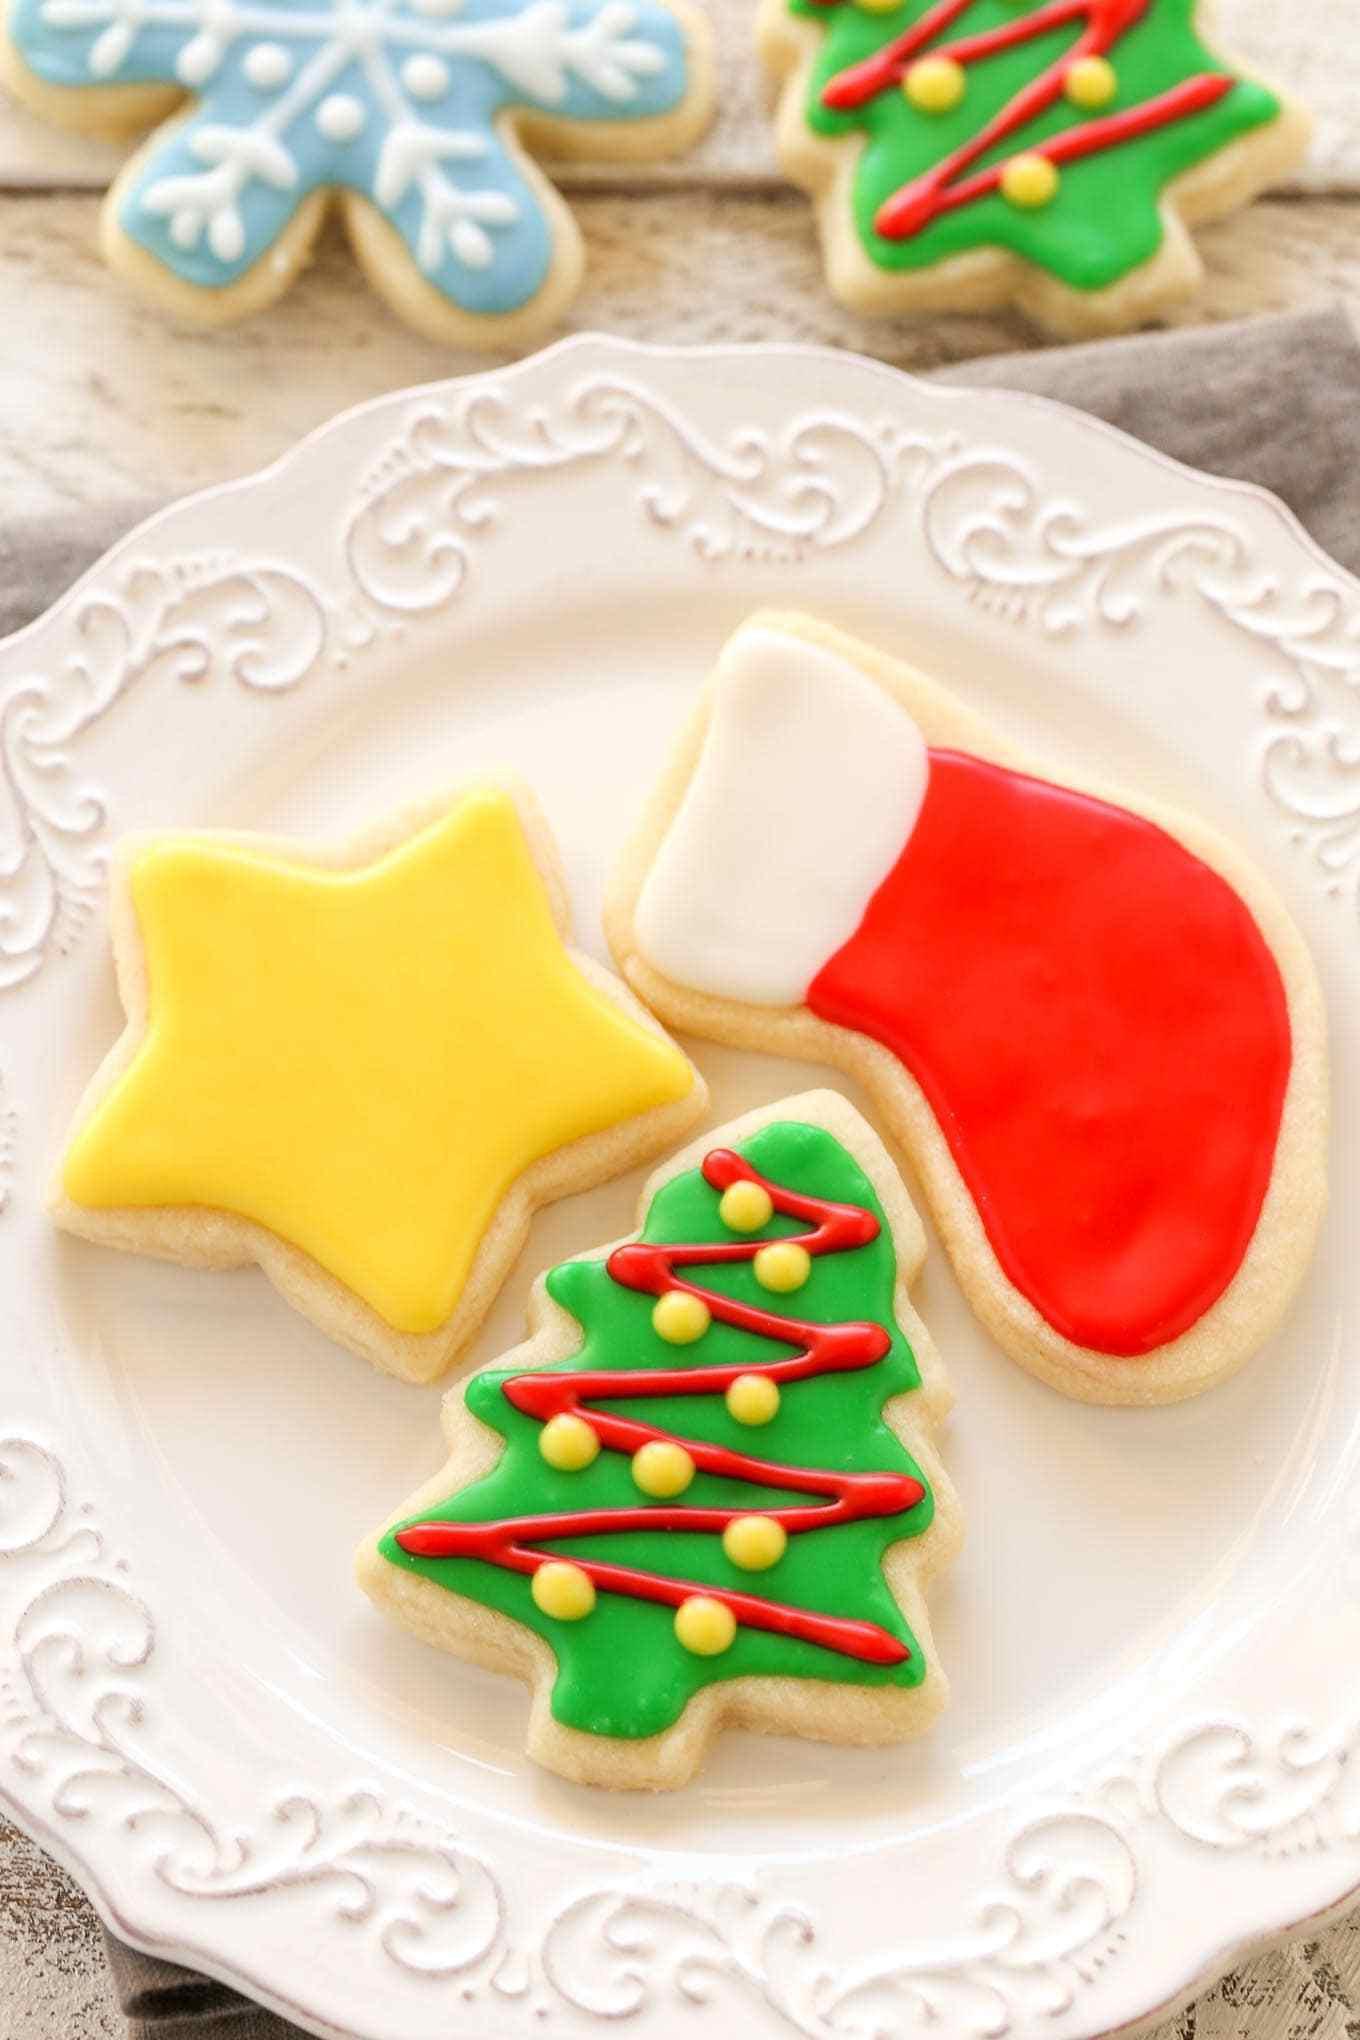 Christmas Cut Out Sugar Cookies  Soft Christmas Cut Out Sugar Cookies Live Well Bake ten